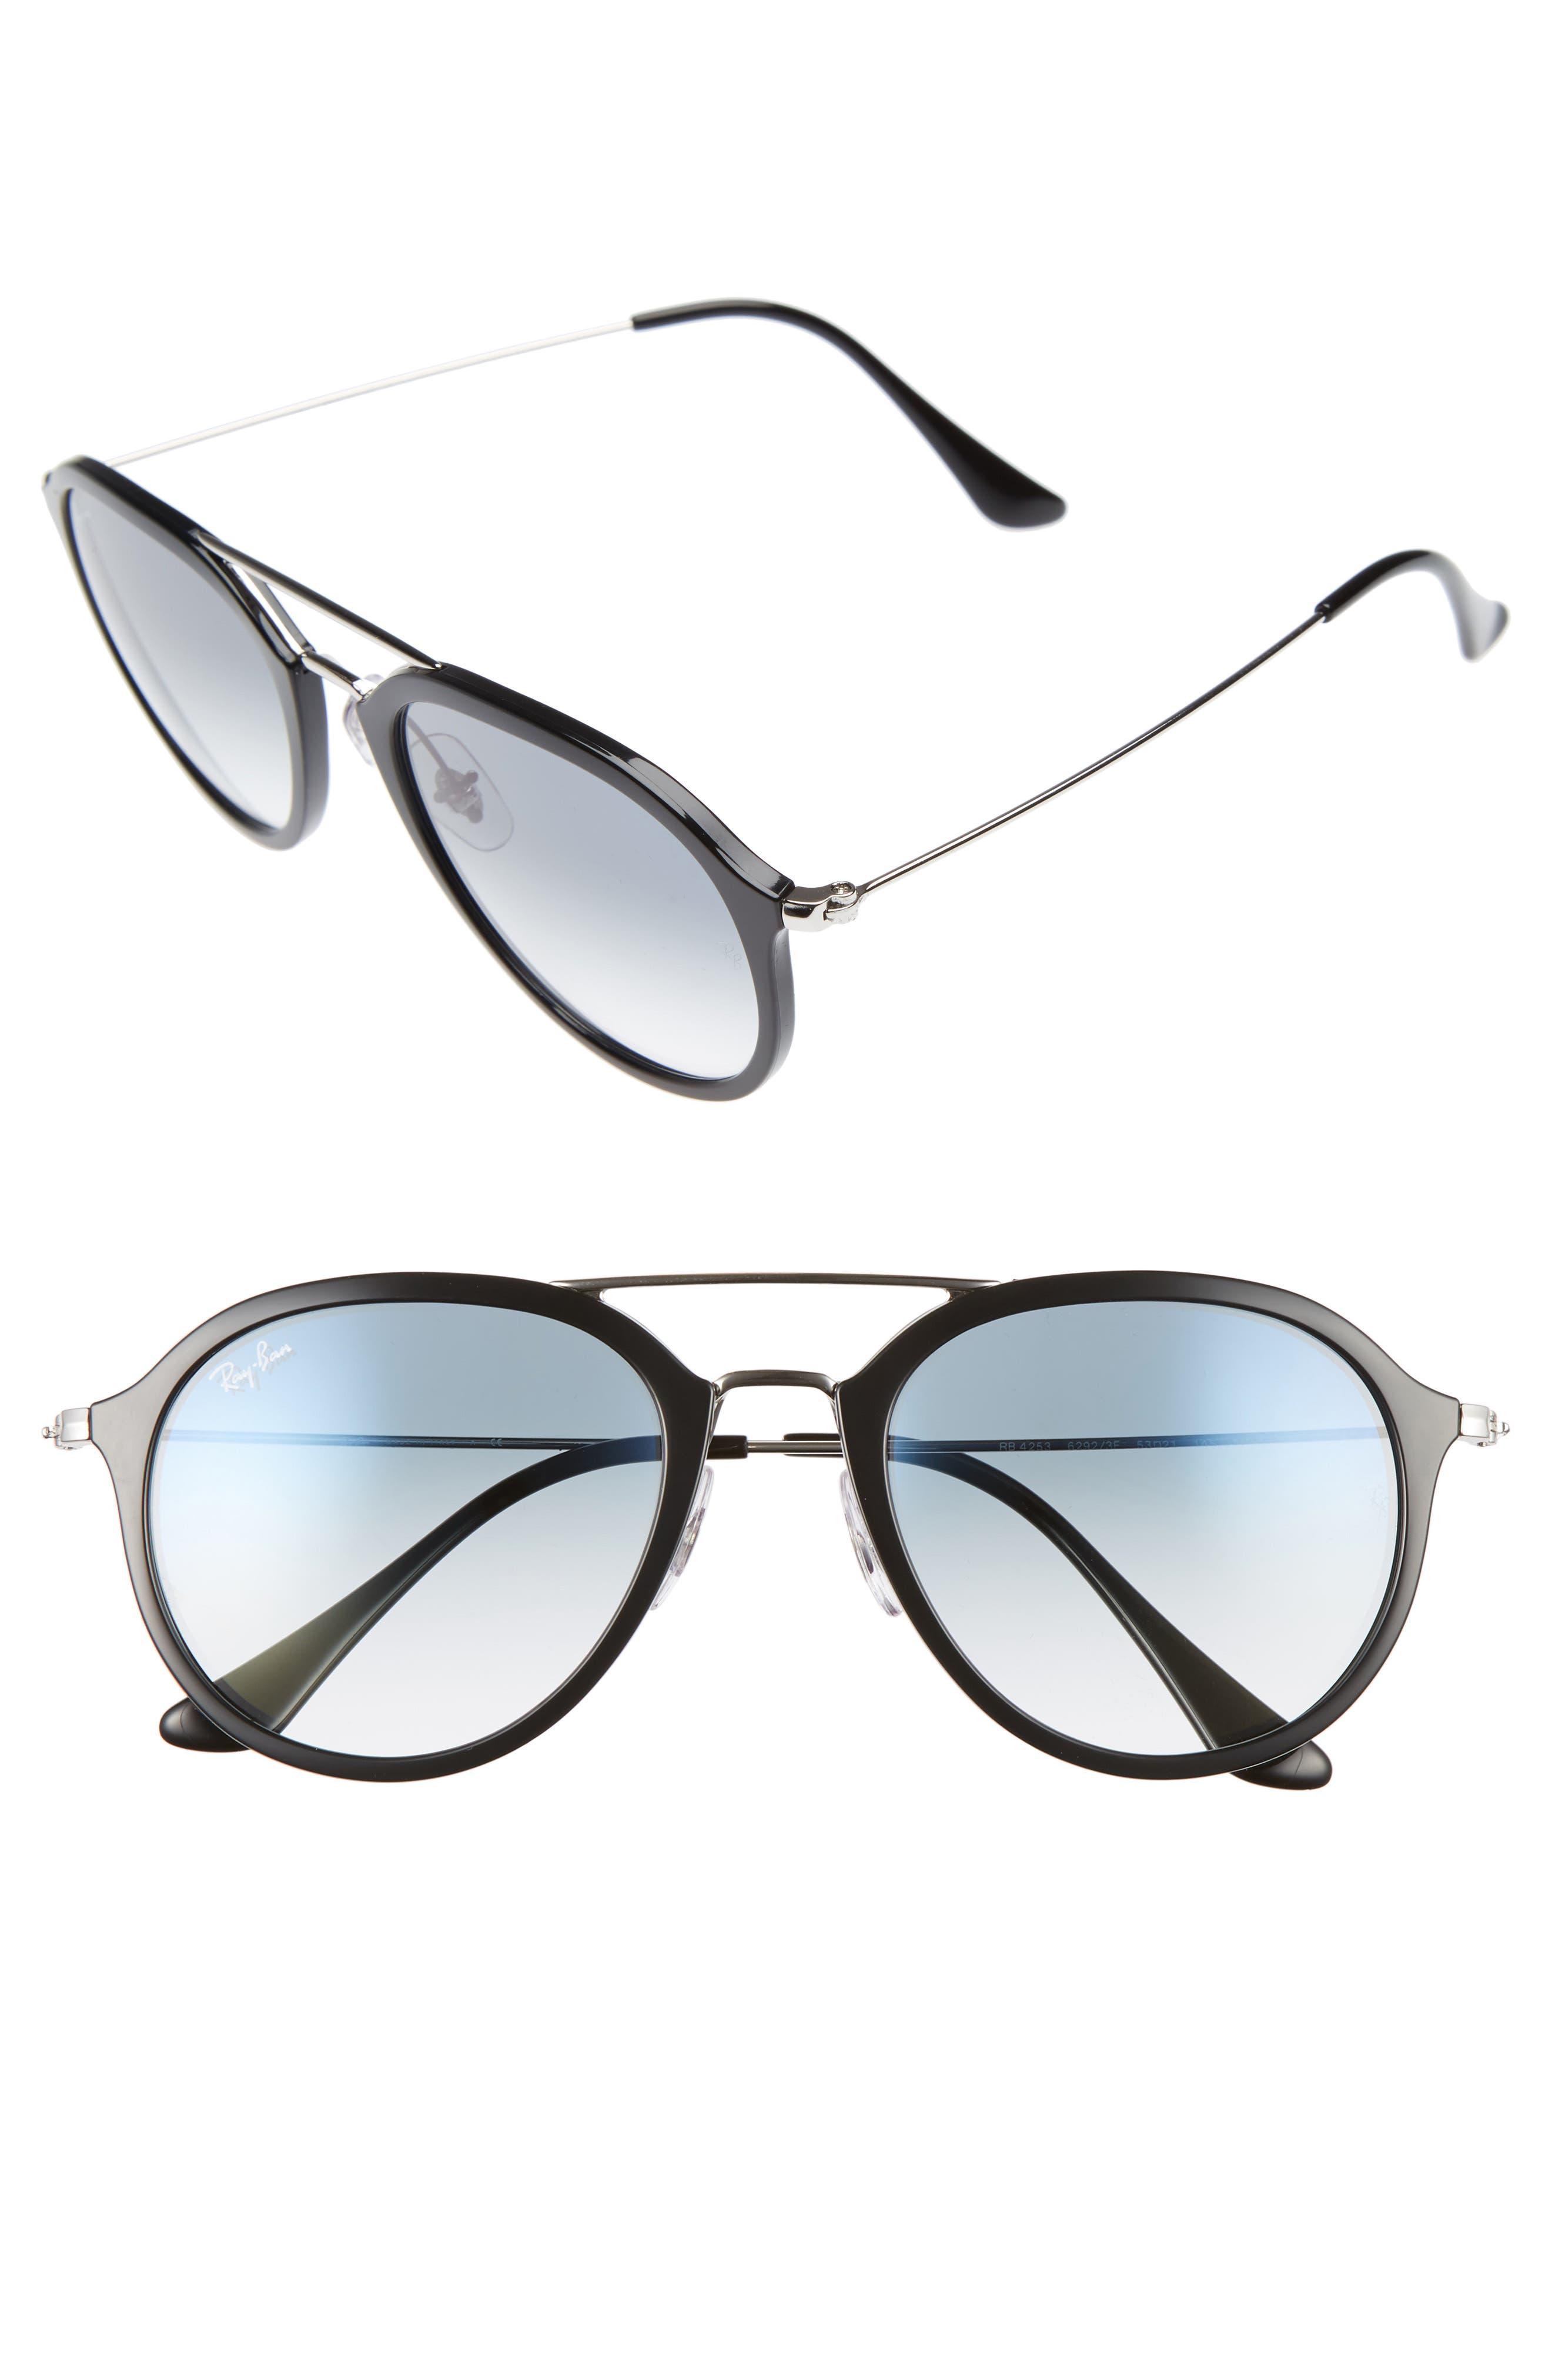 53mm Aviator Sunglasses,                         Main,                         color, Black/ Silver